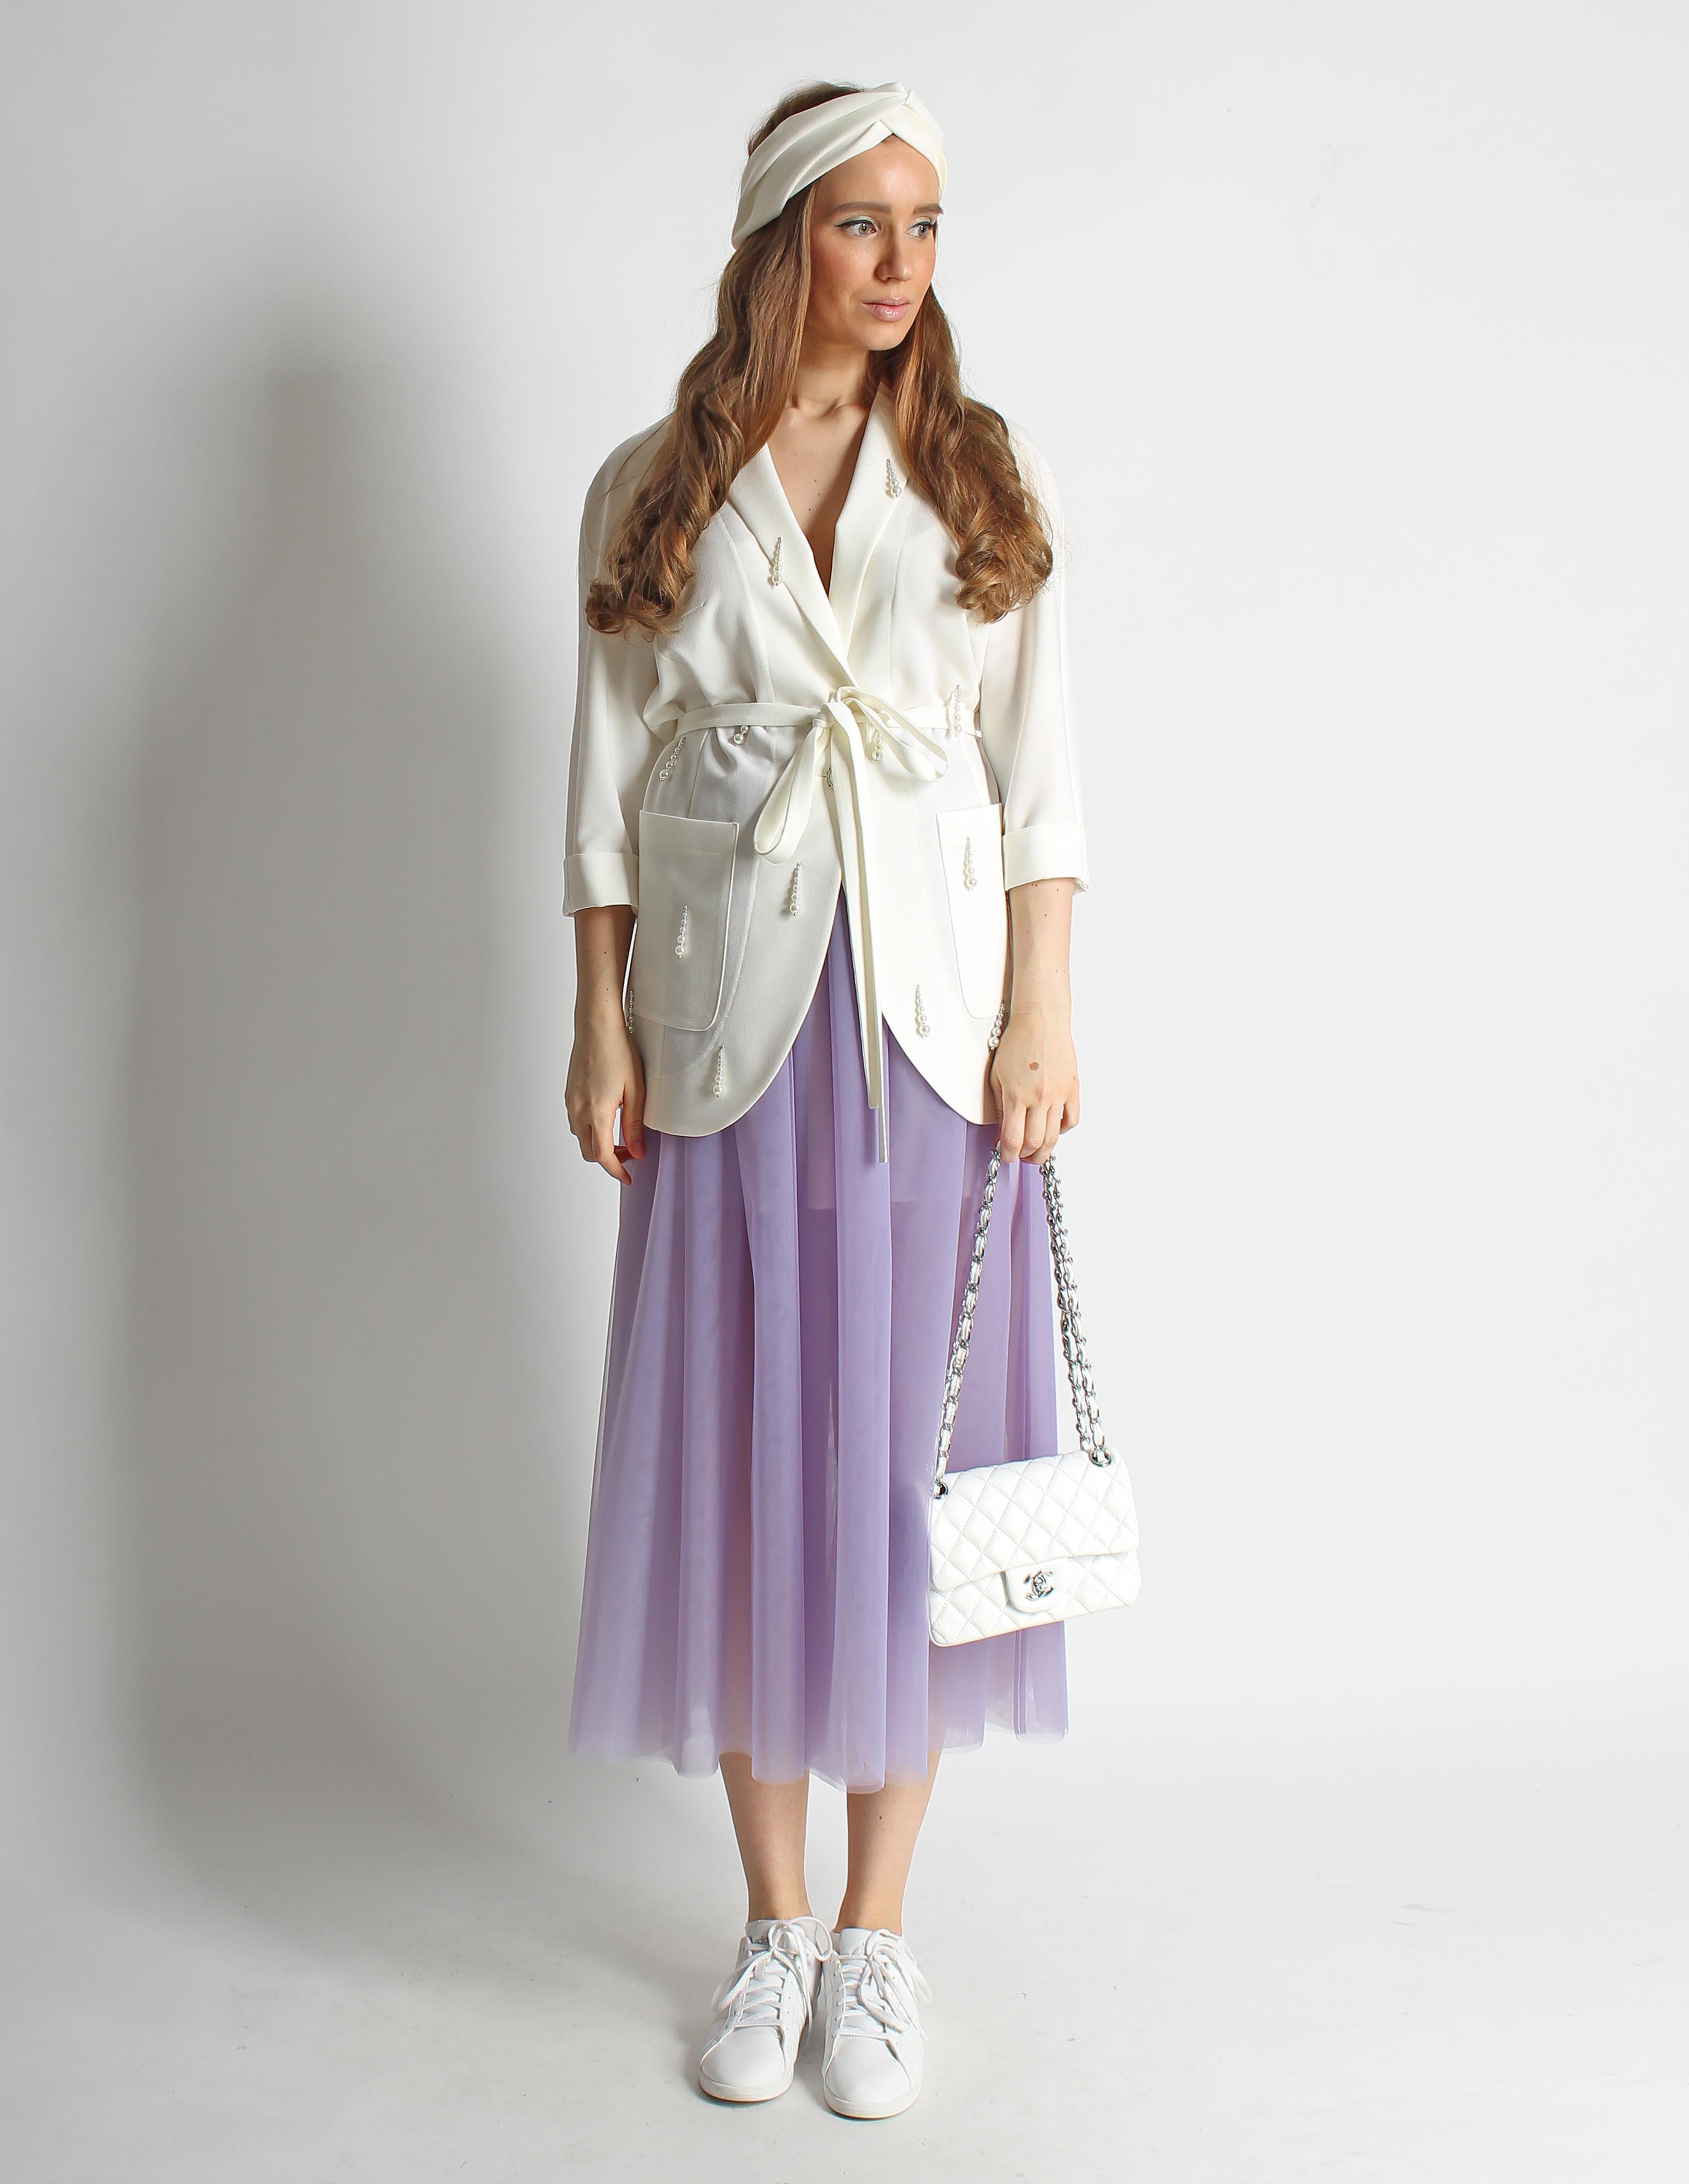 Жакет и юбка из фатина